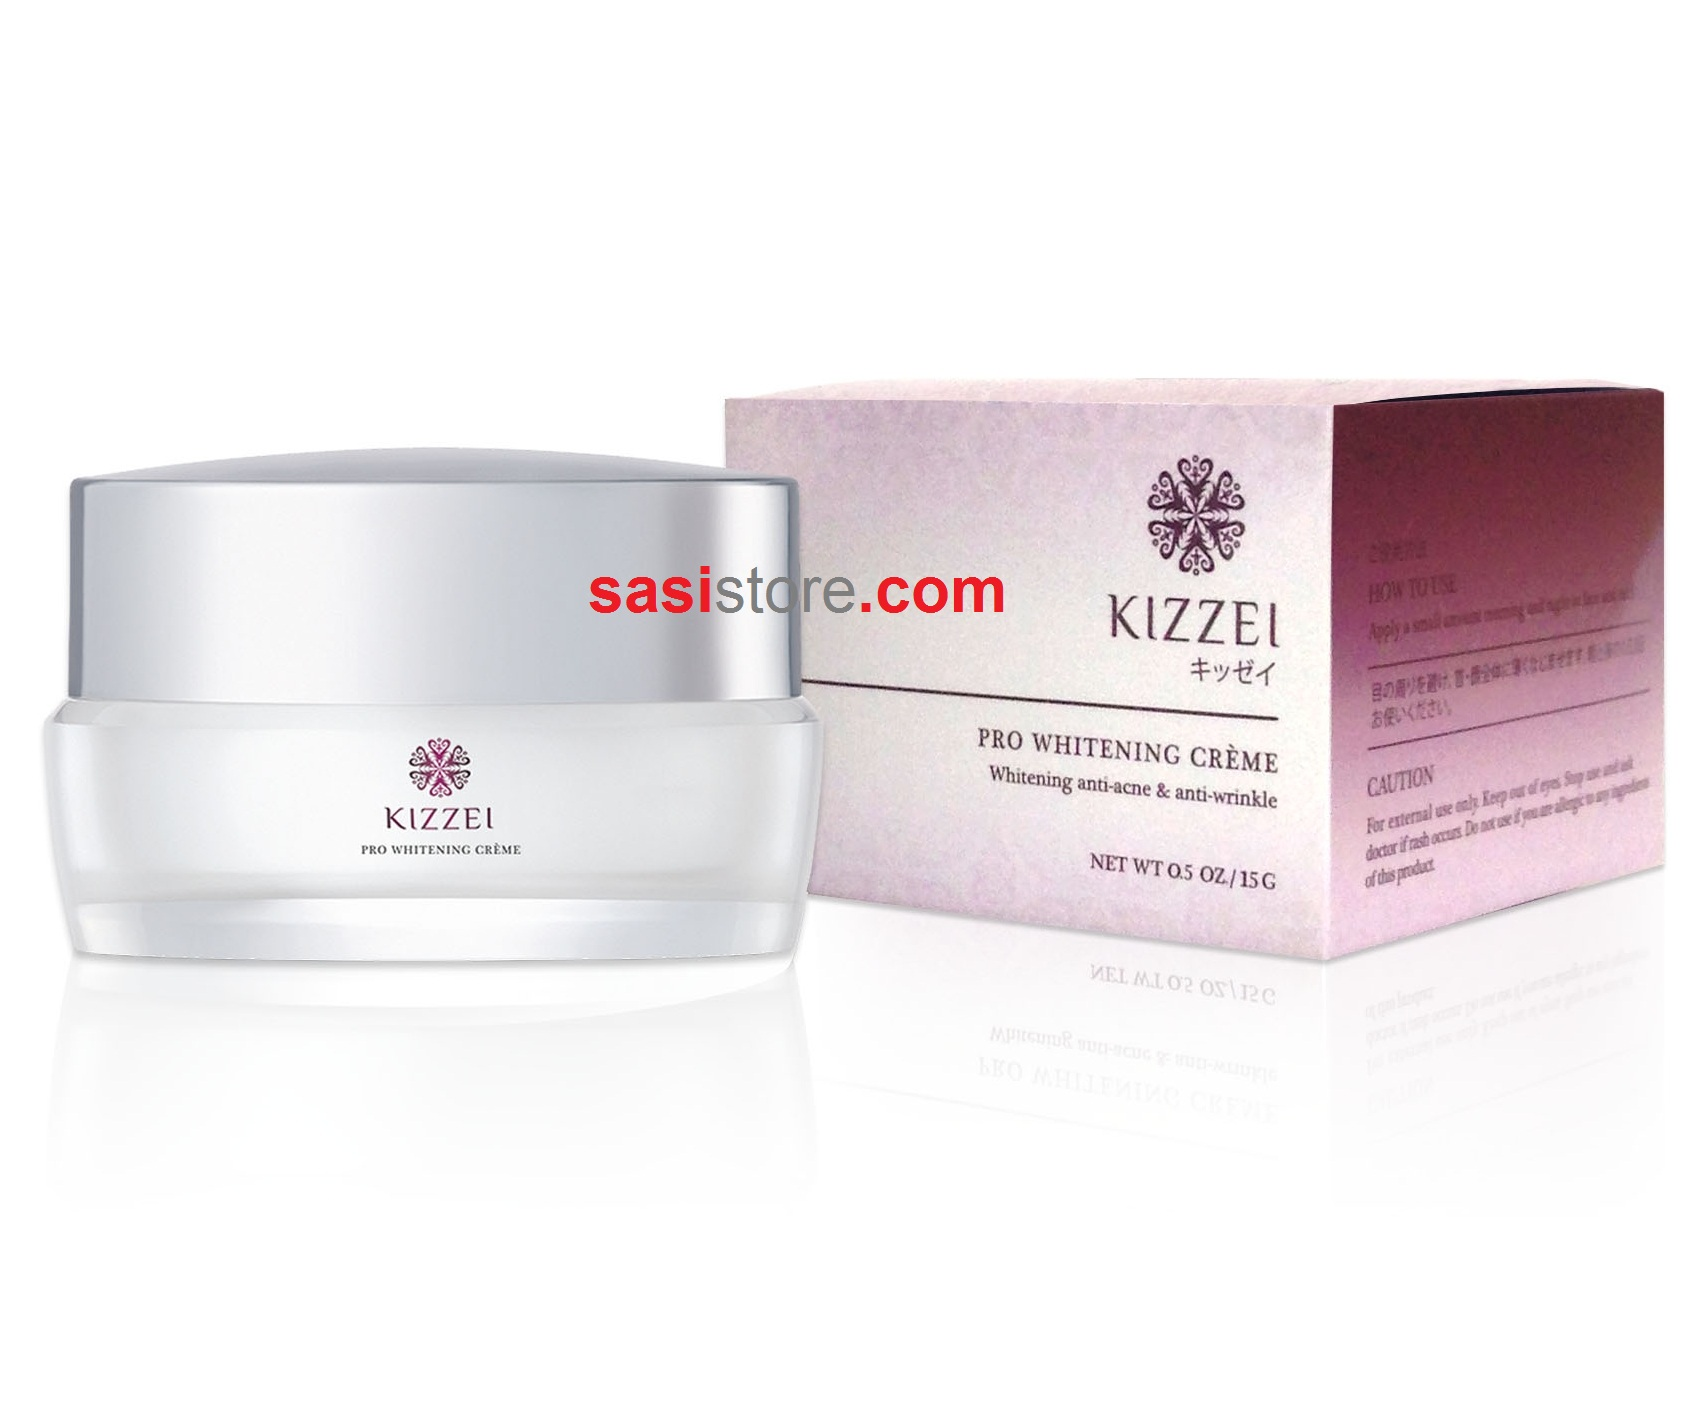 Kizzei Pro Whitening Crème 5g